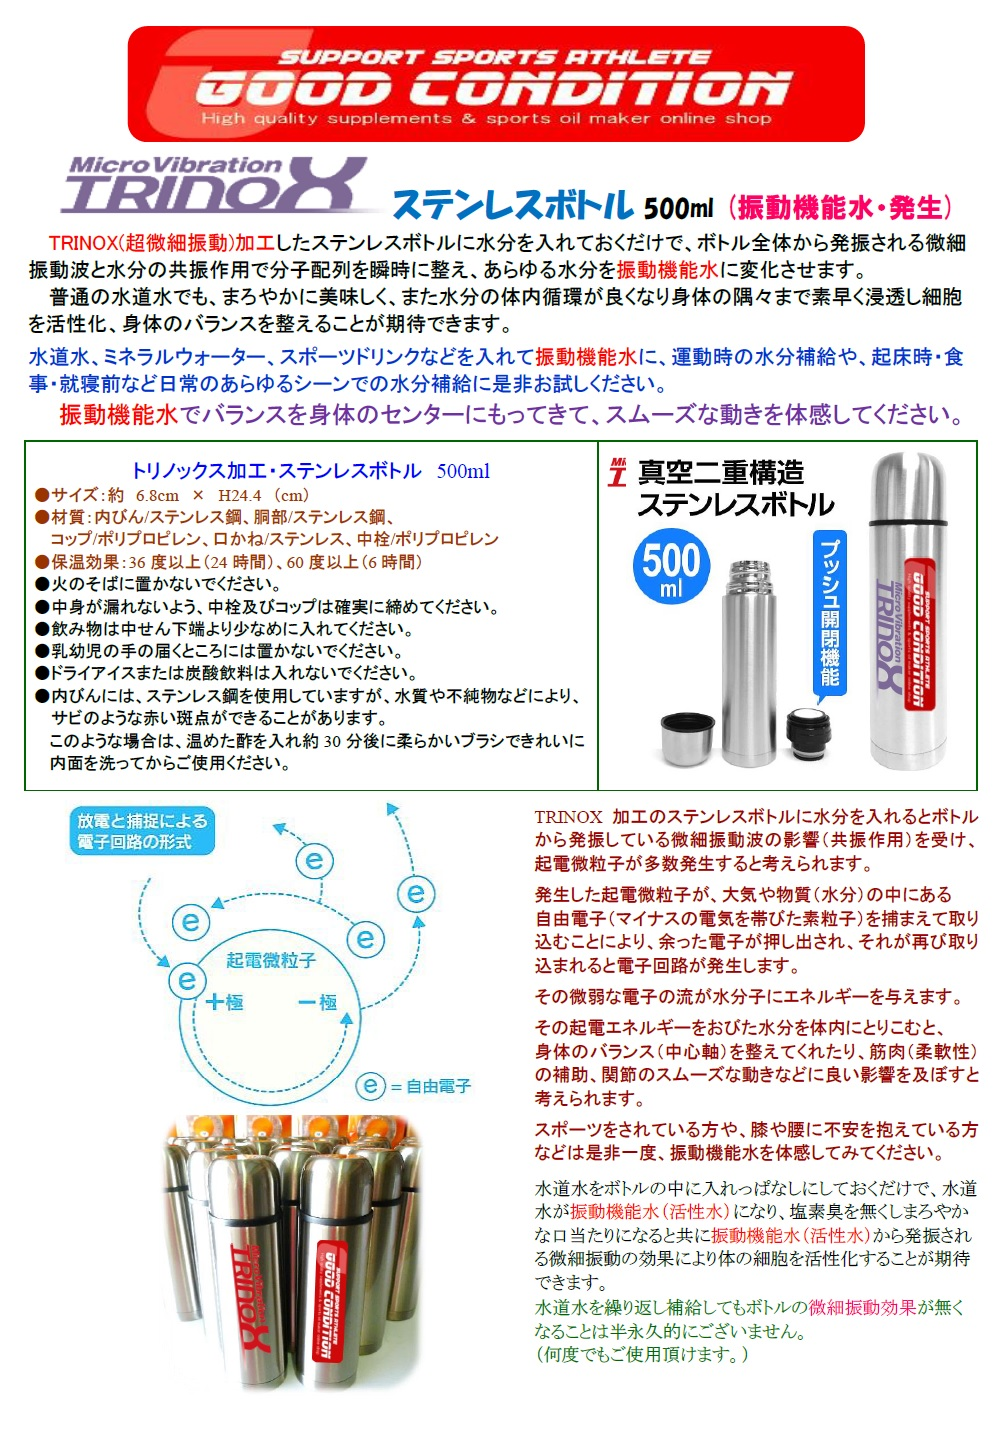 TRINOX加工・ステンレスボトル500ml(振動機能水)